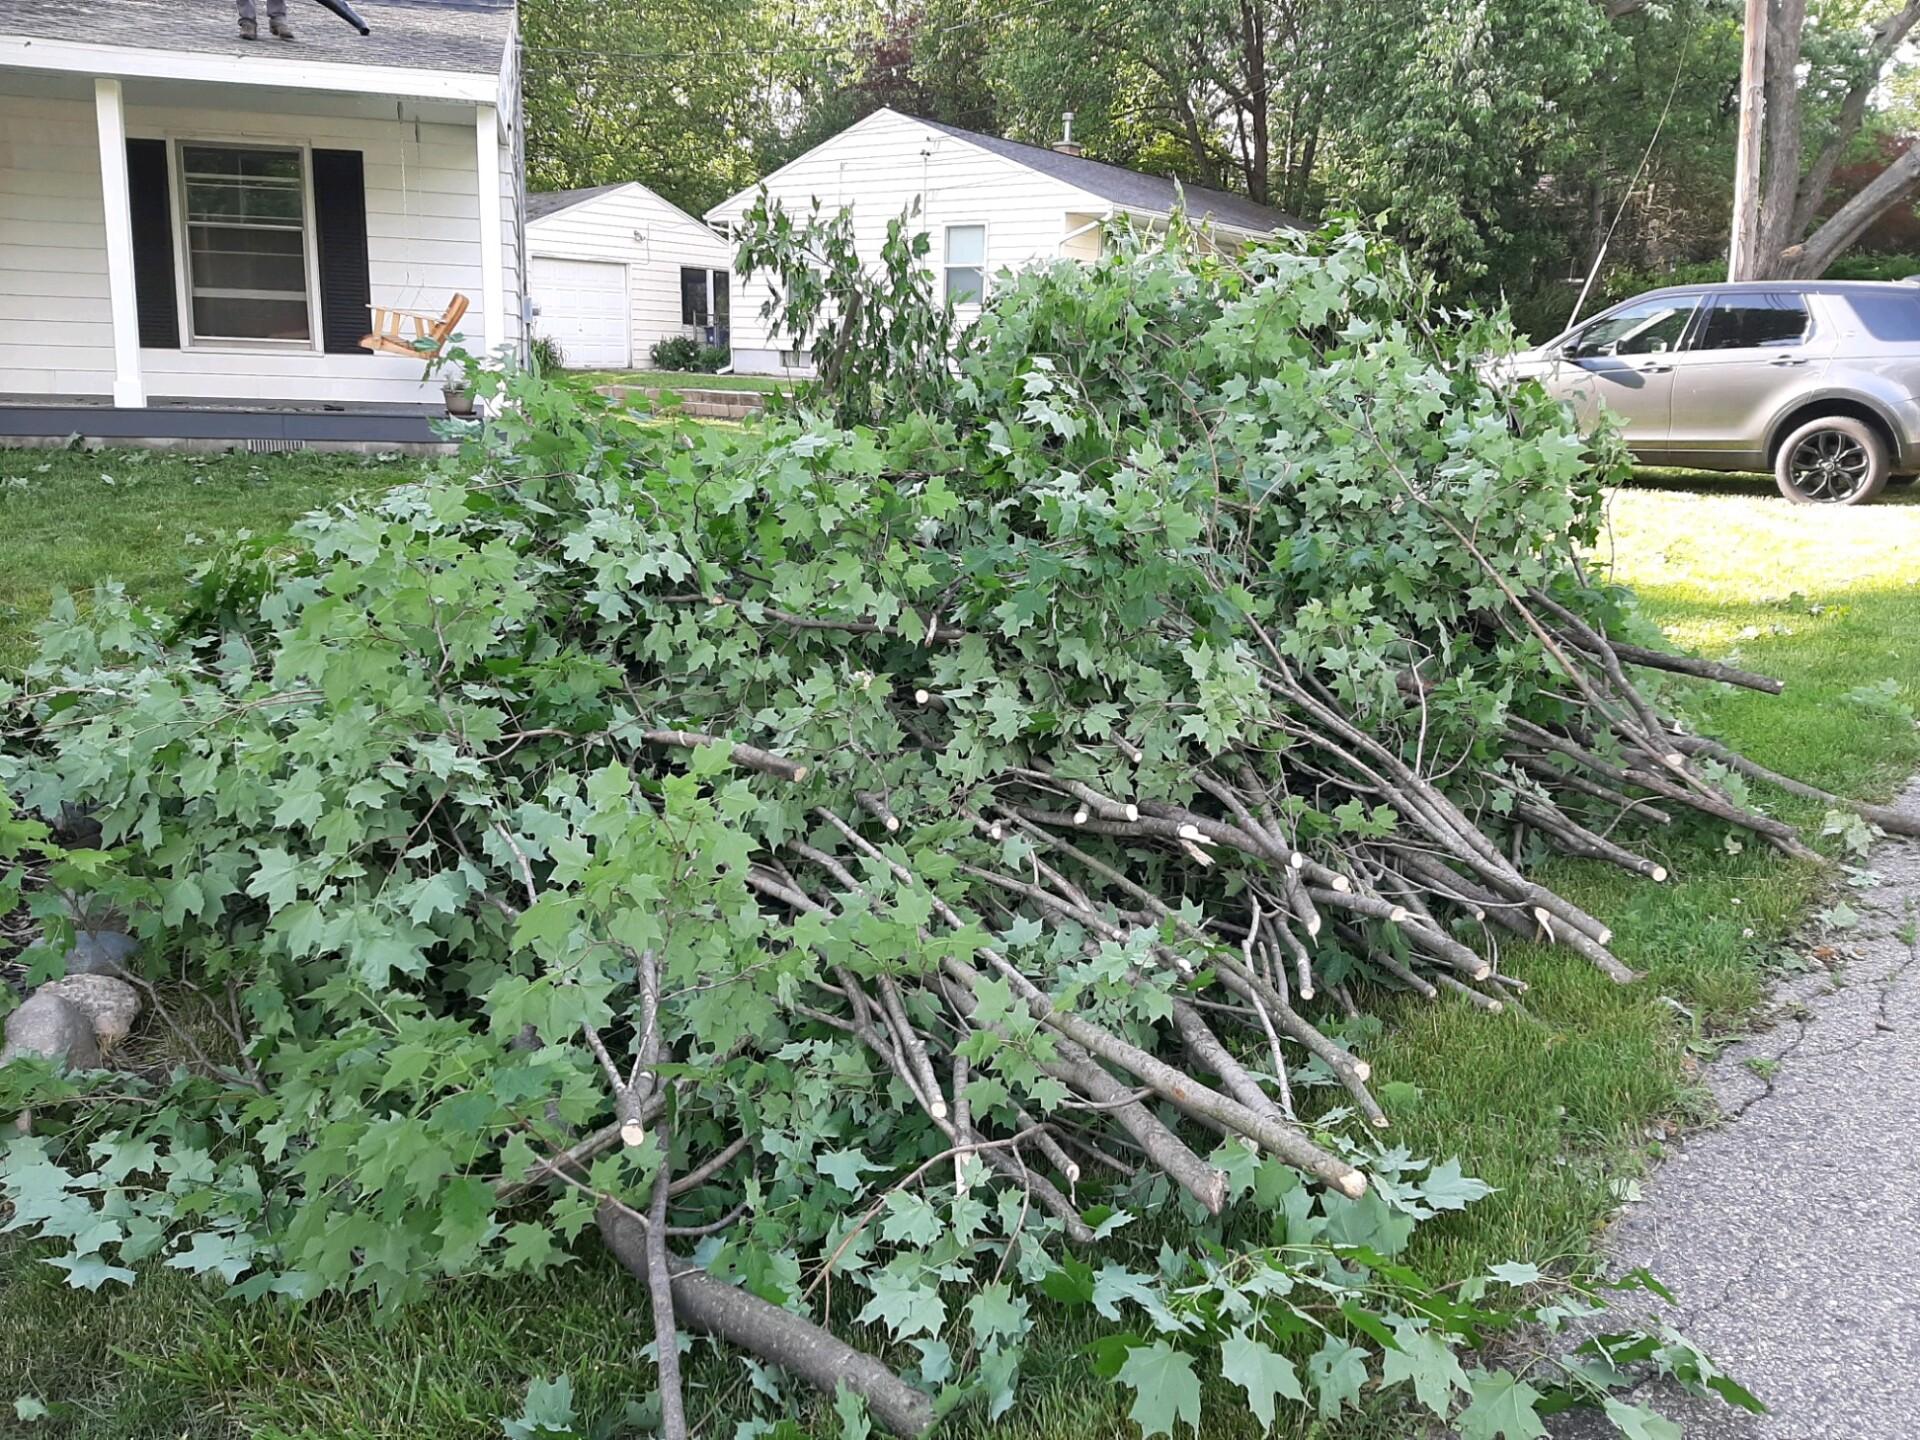 Grand Rapids storm damage 4.jpg